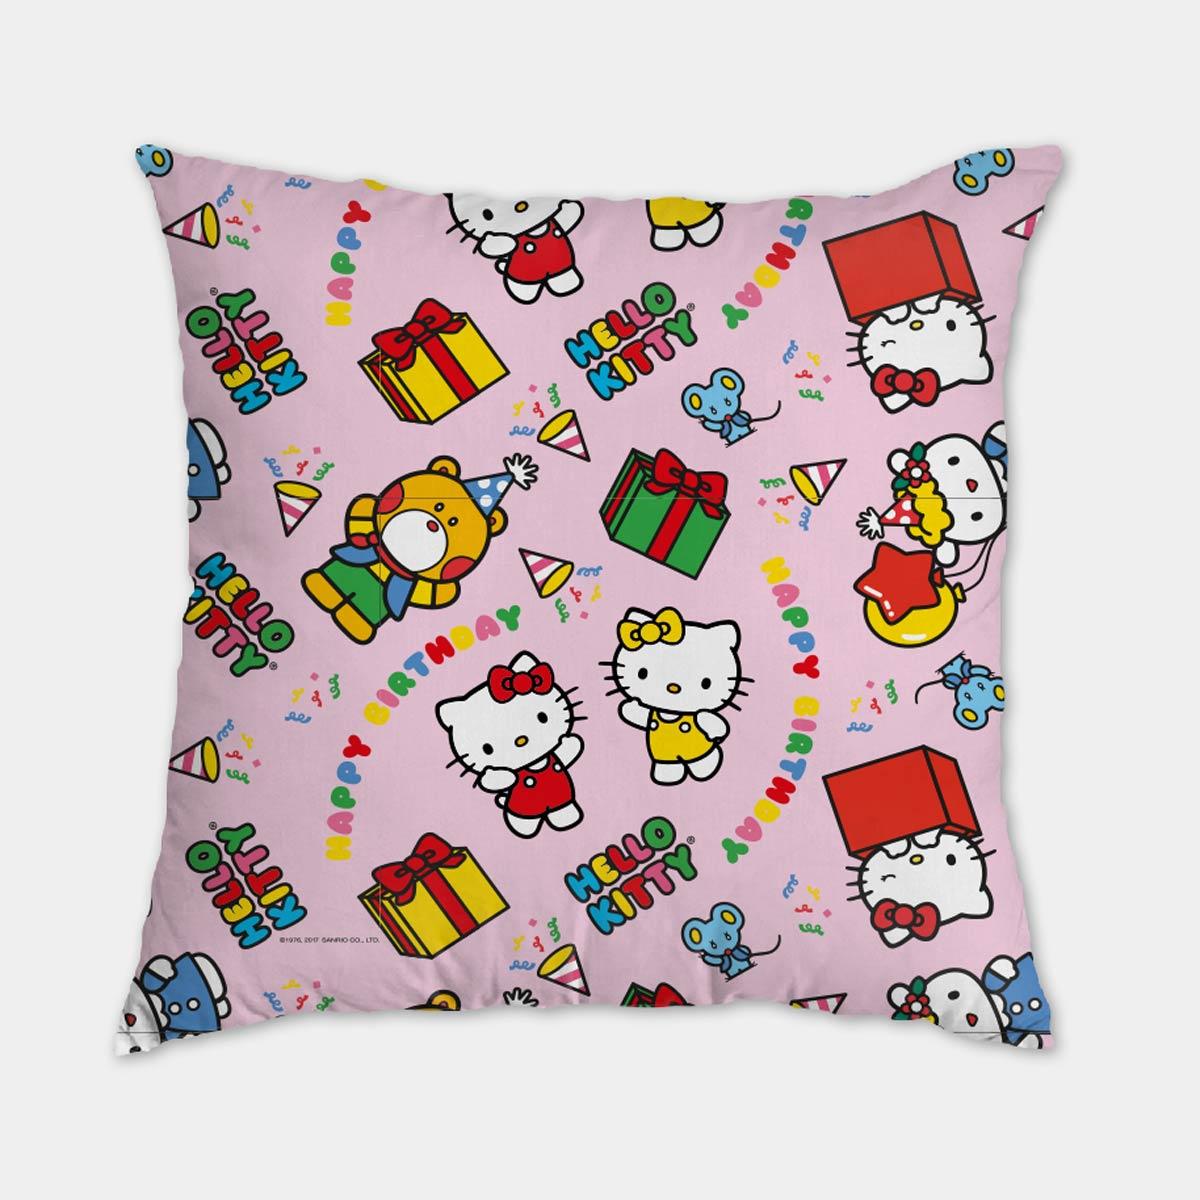 Almofada Hello Kitty Party Patterns